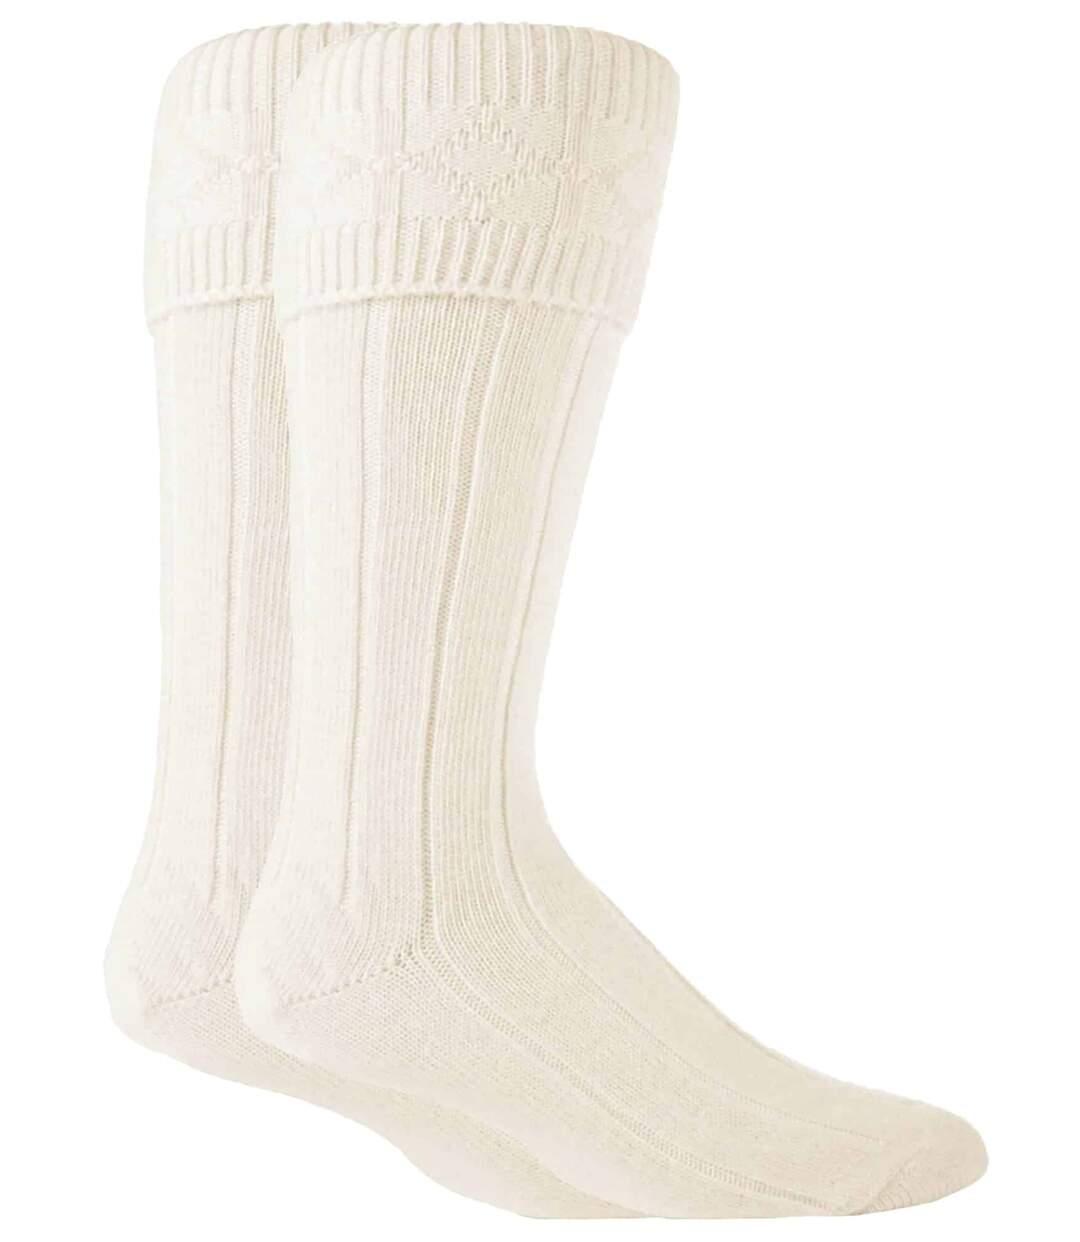 Mens Knee High Wool Ribbed Cream Hose Kilt Socks